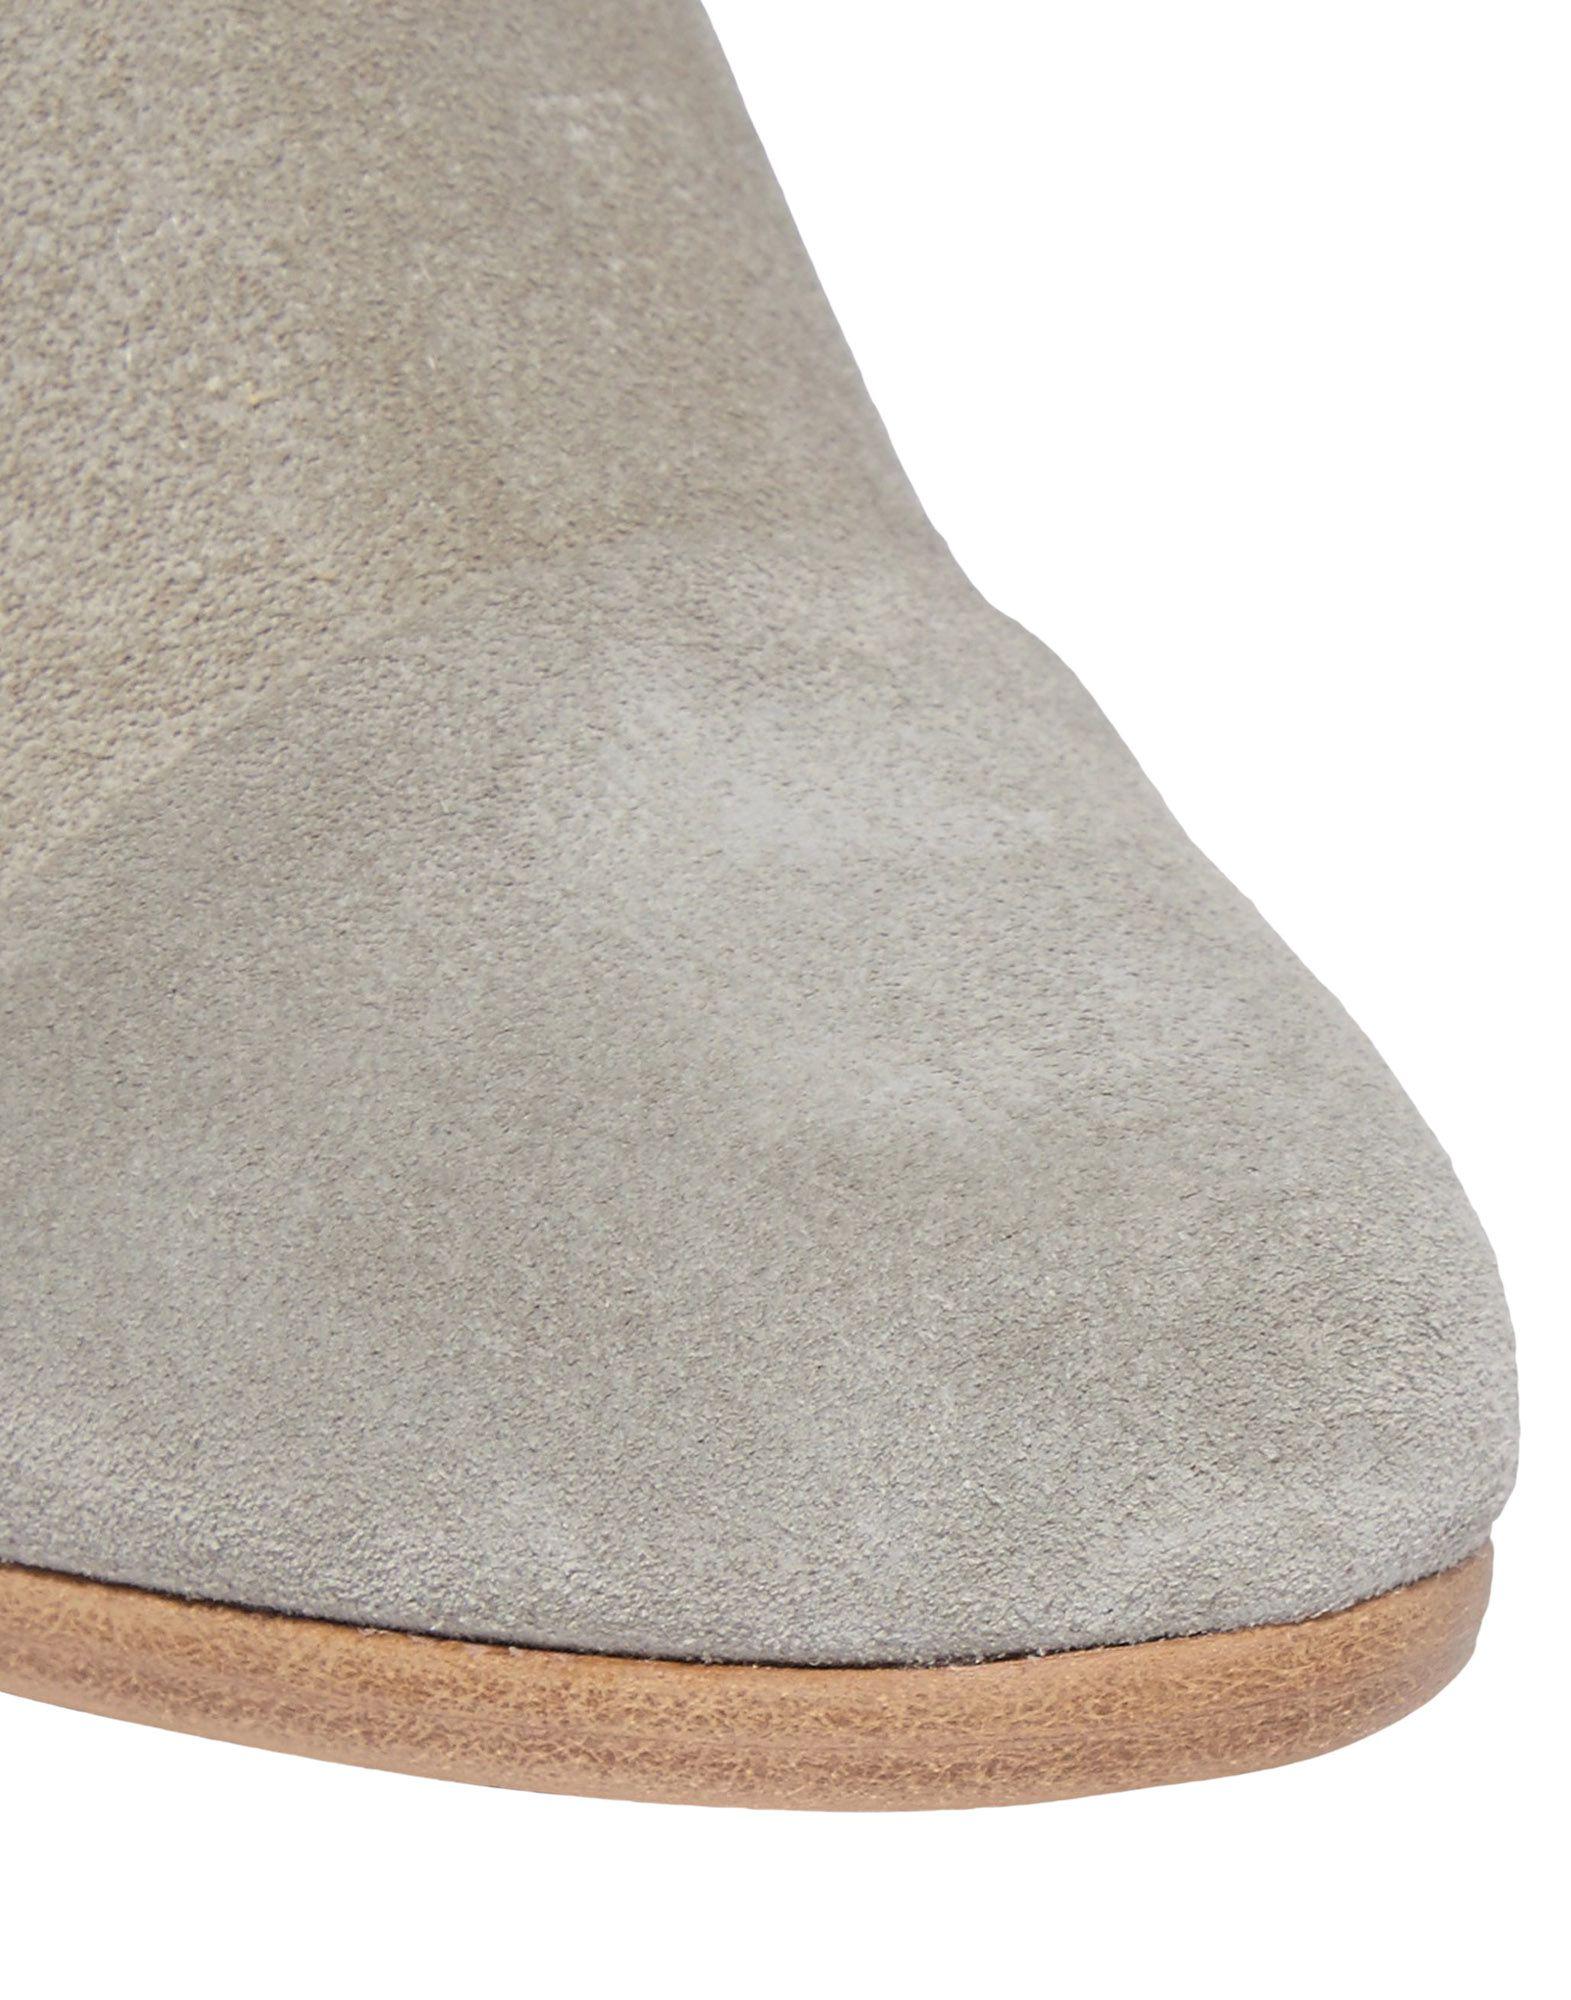 Rag Damen & Bone Stiefelette Damen Rag  11511159HR Neue Schuhe ece5f1